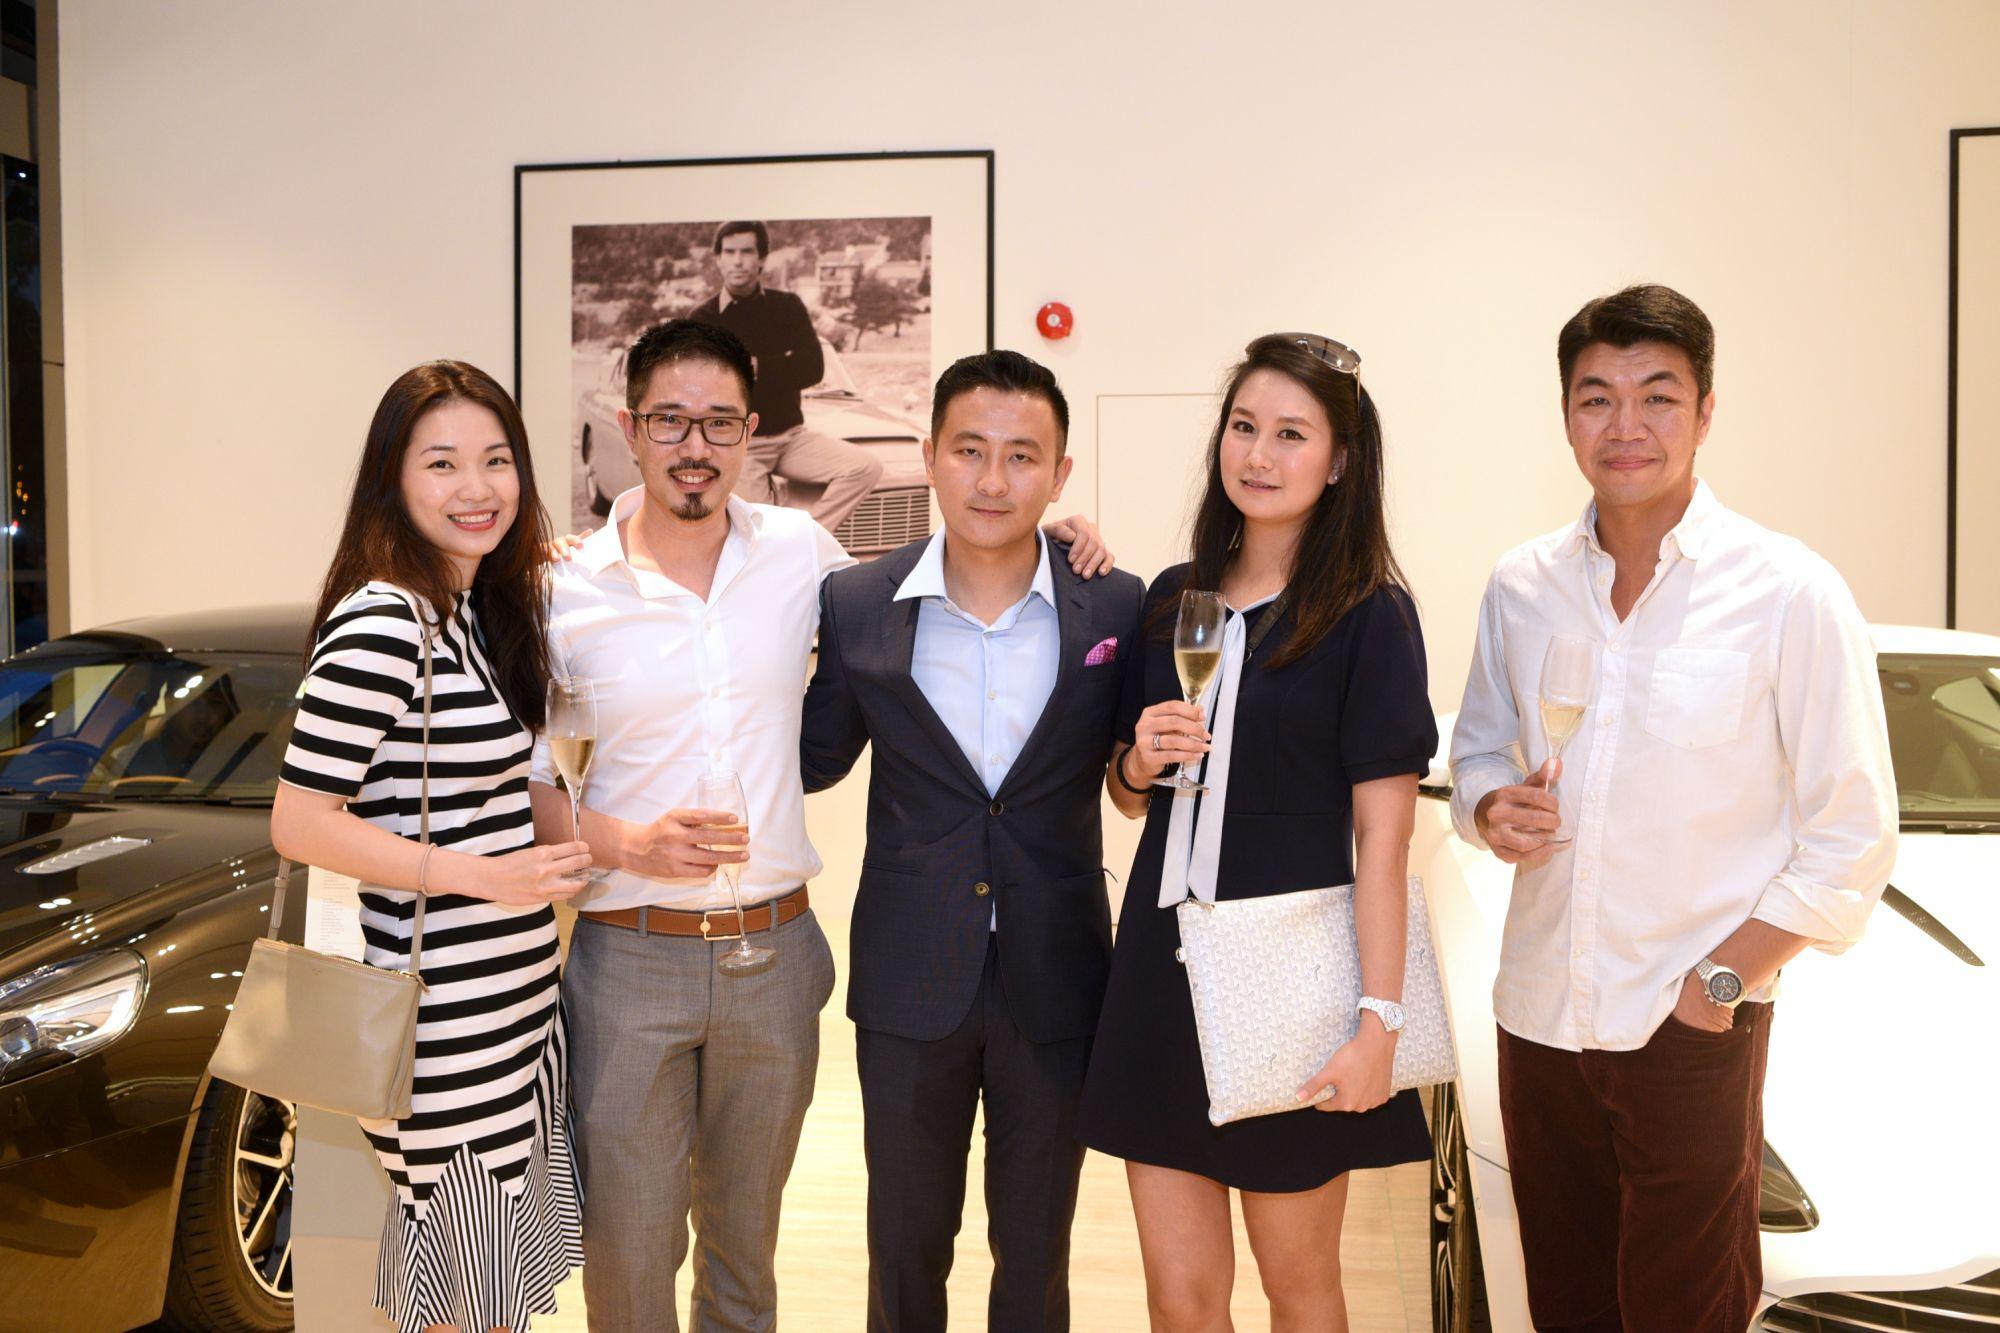 Michelle Chui, Jared Kok, Jeremy Chee, Katie Kang, Anton Chan